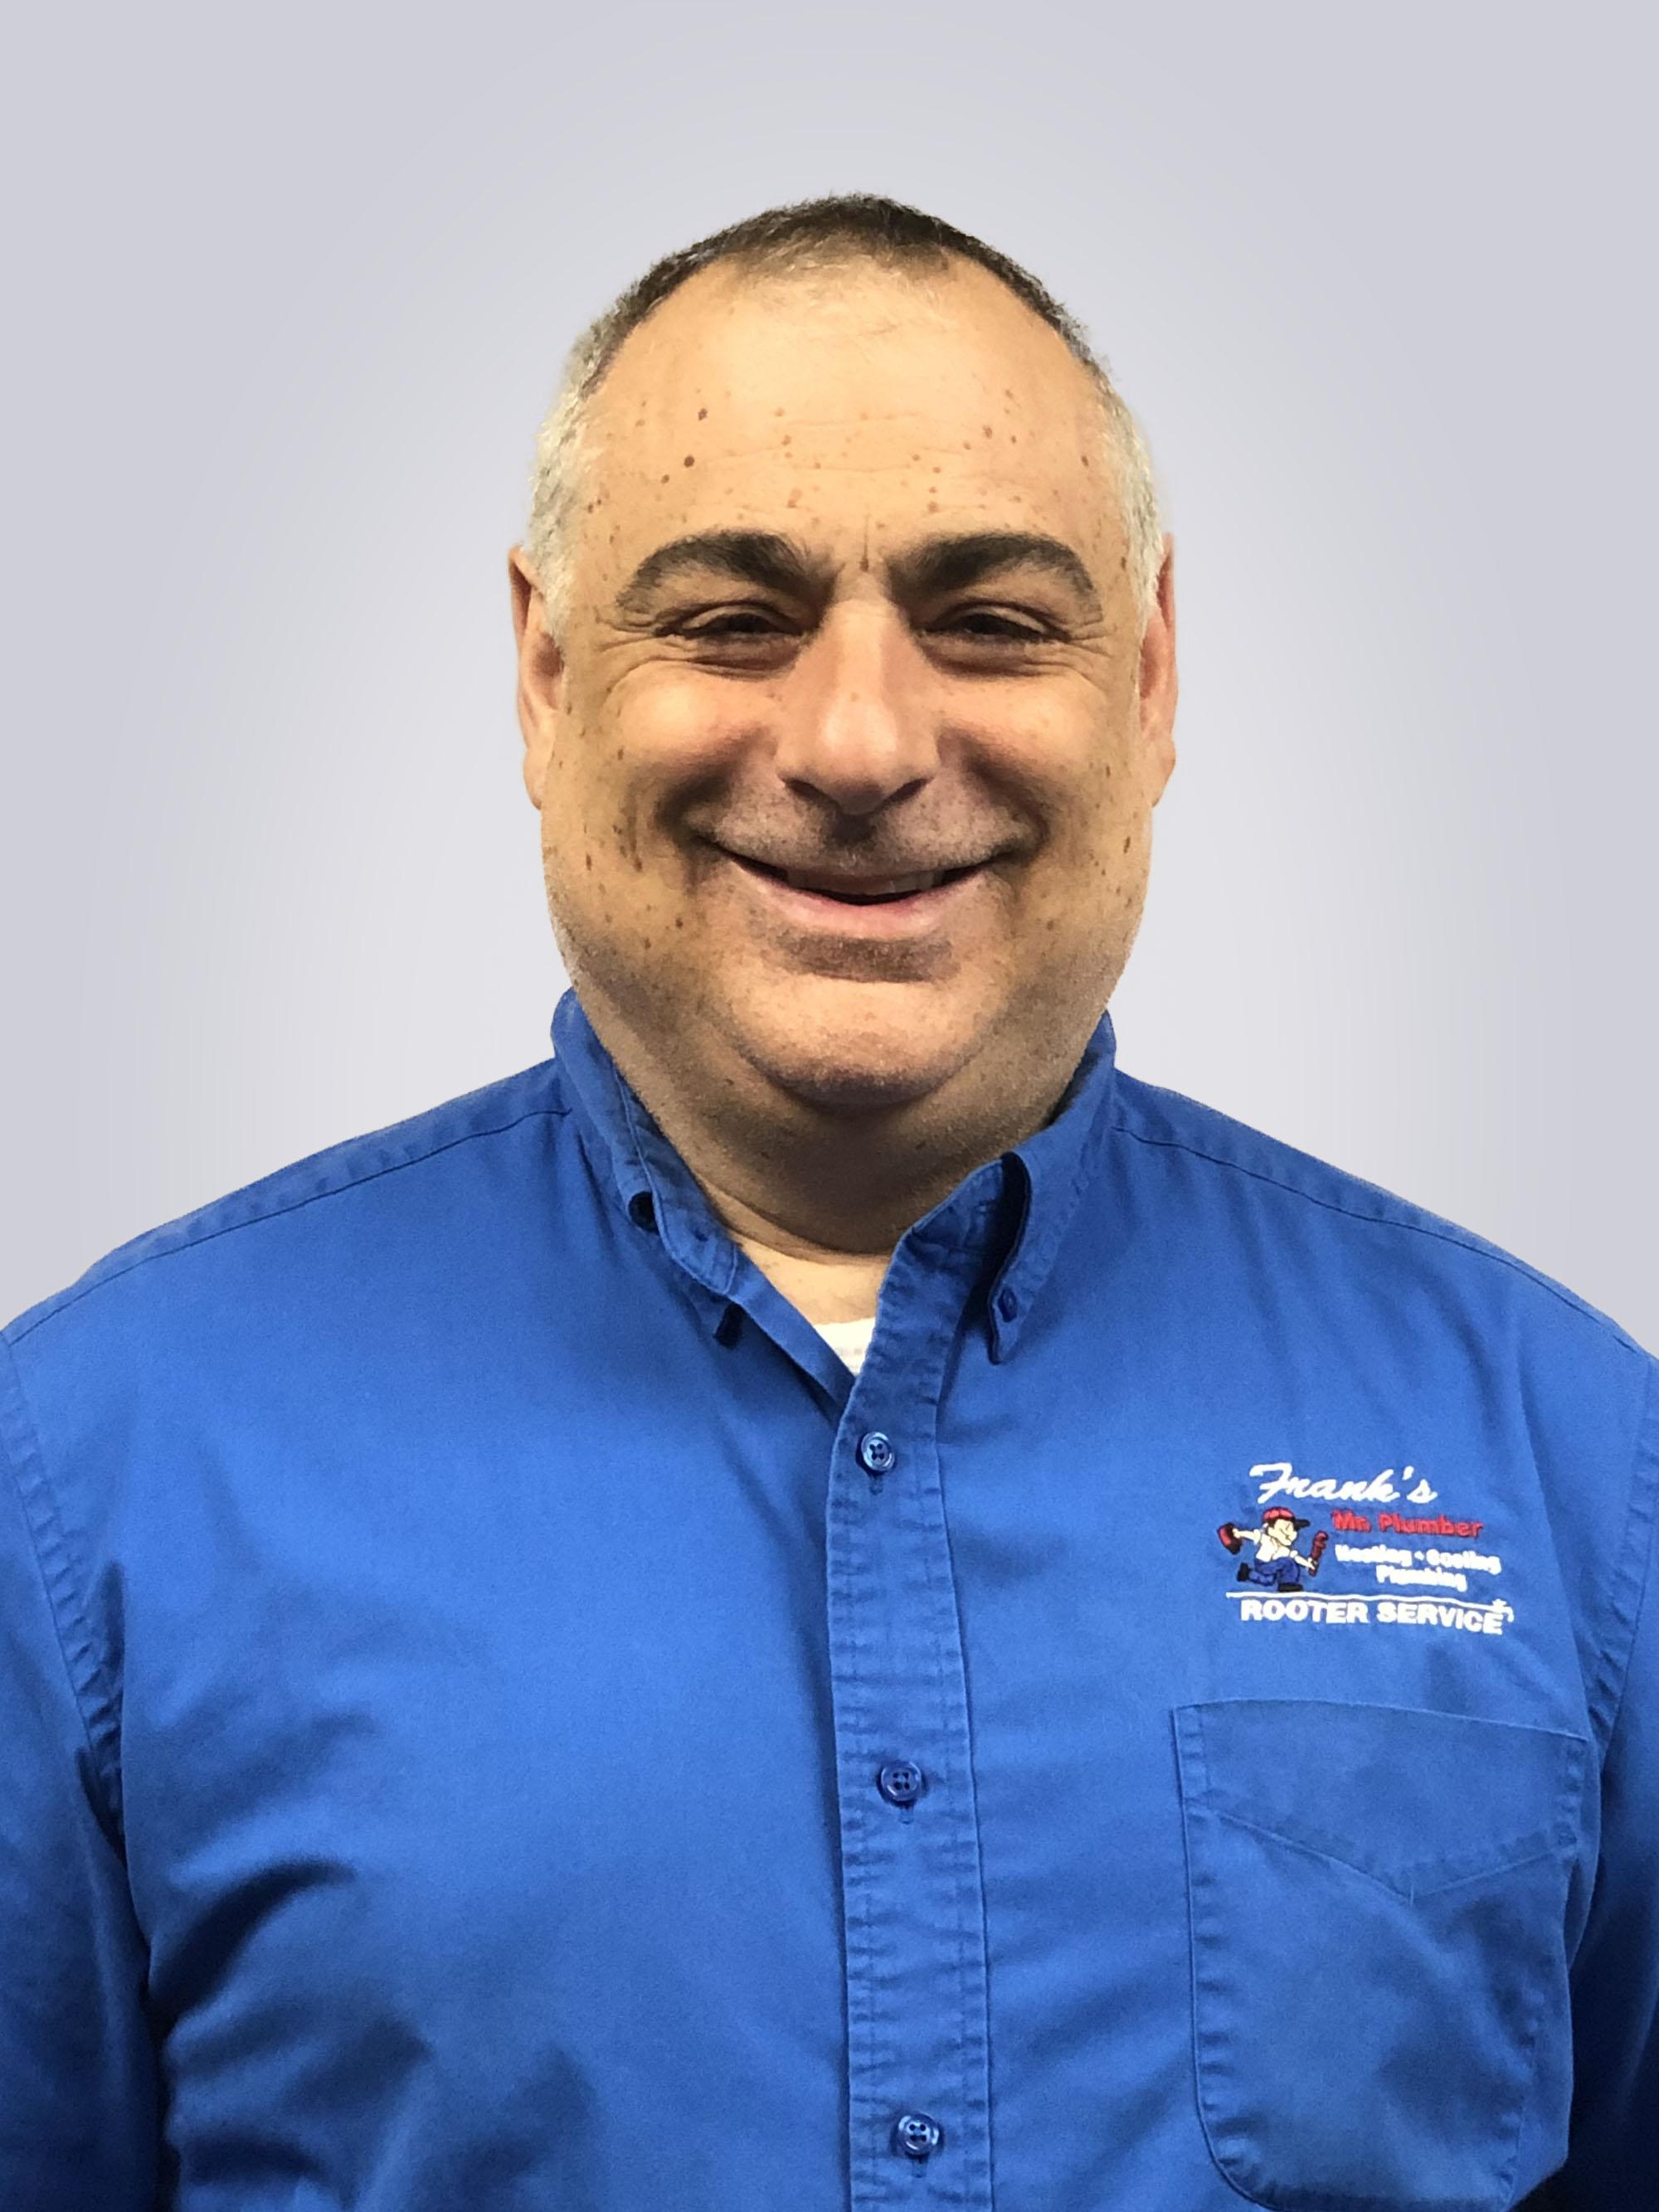 Owner Frank DiMaria